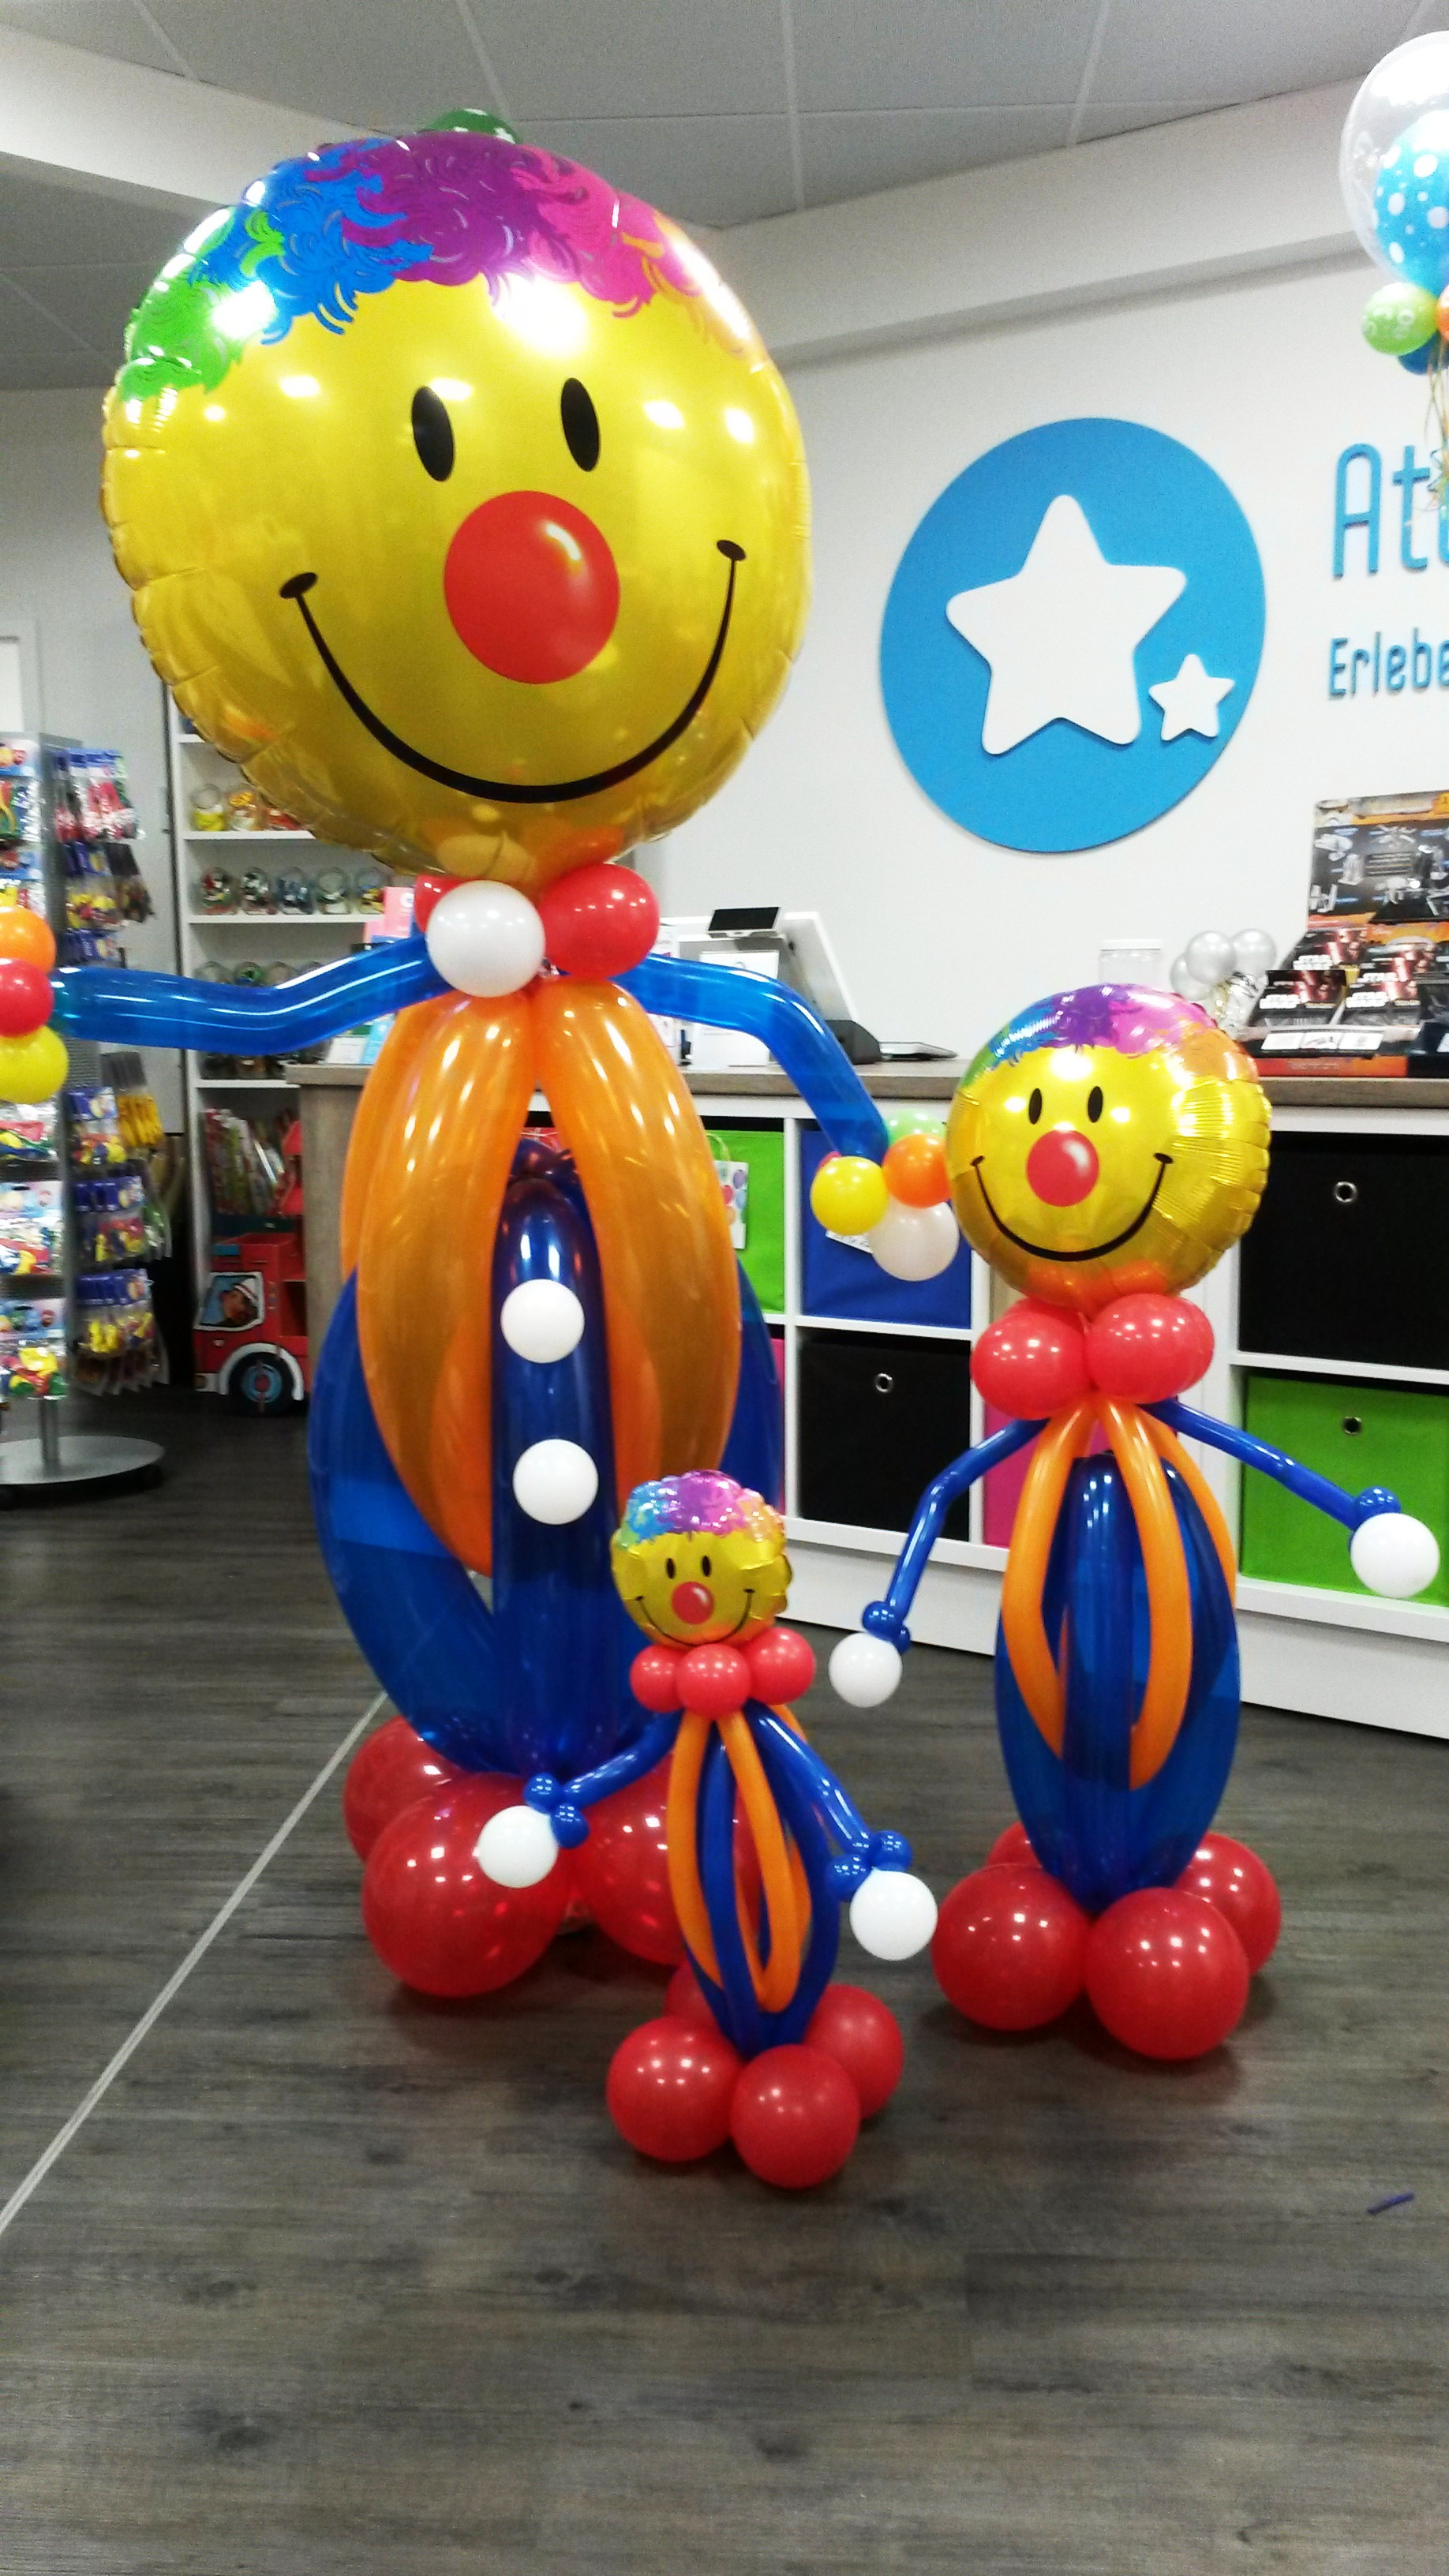 Ballon-Clowns